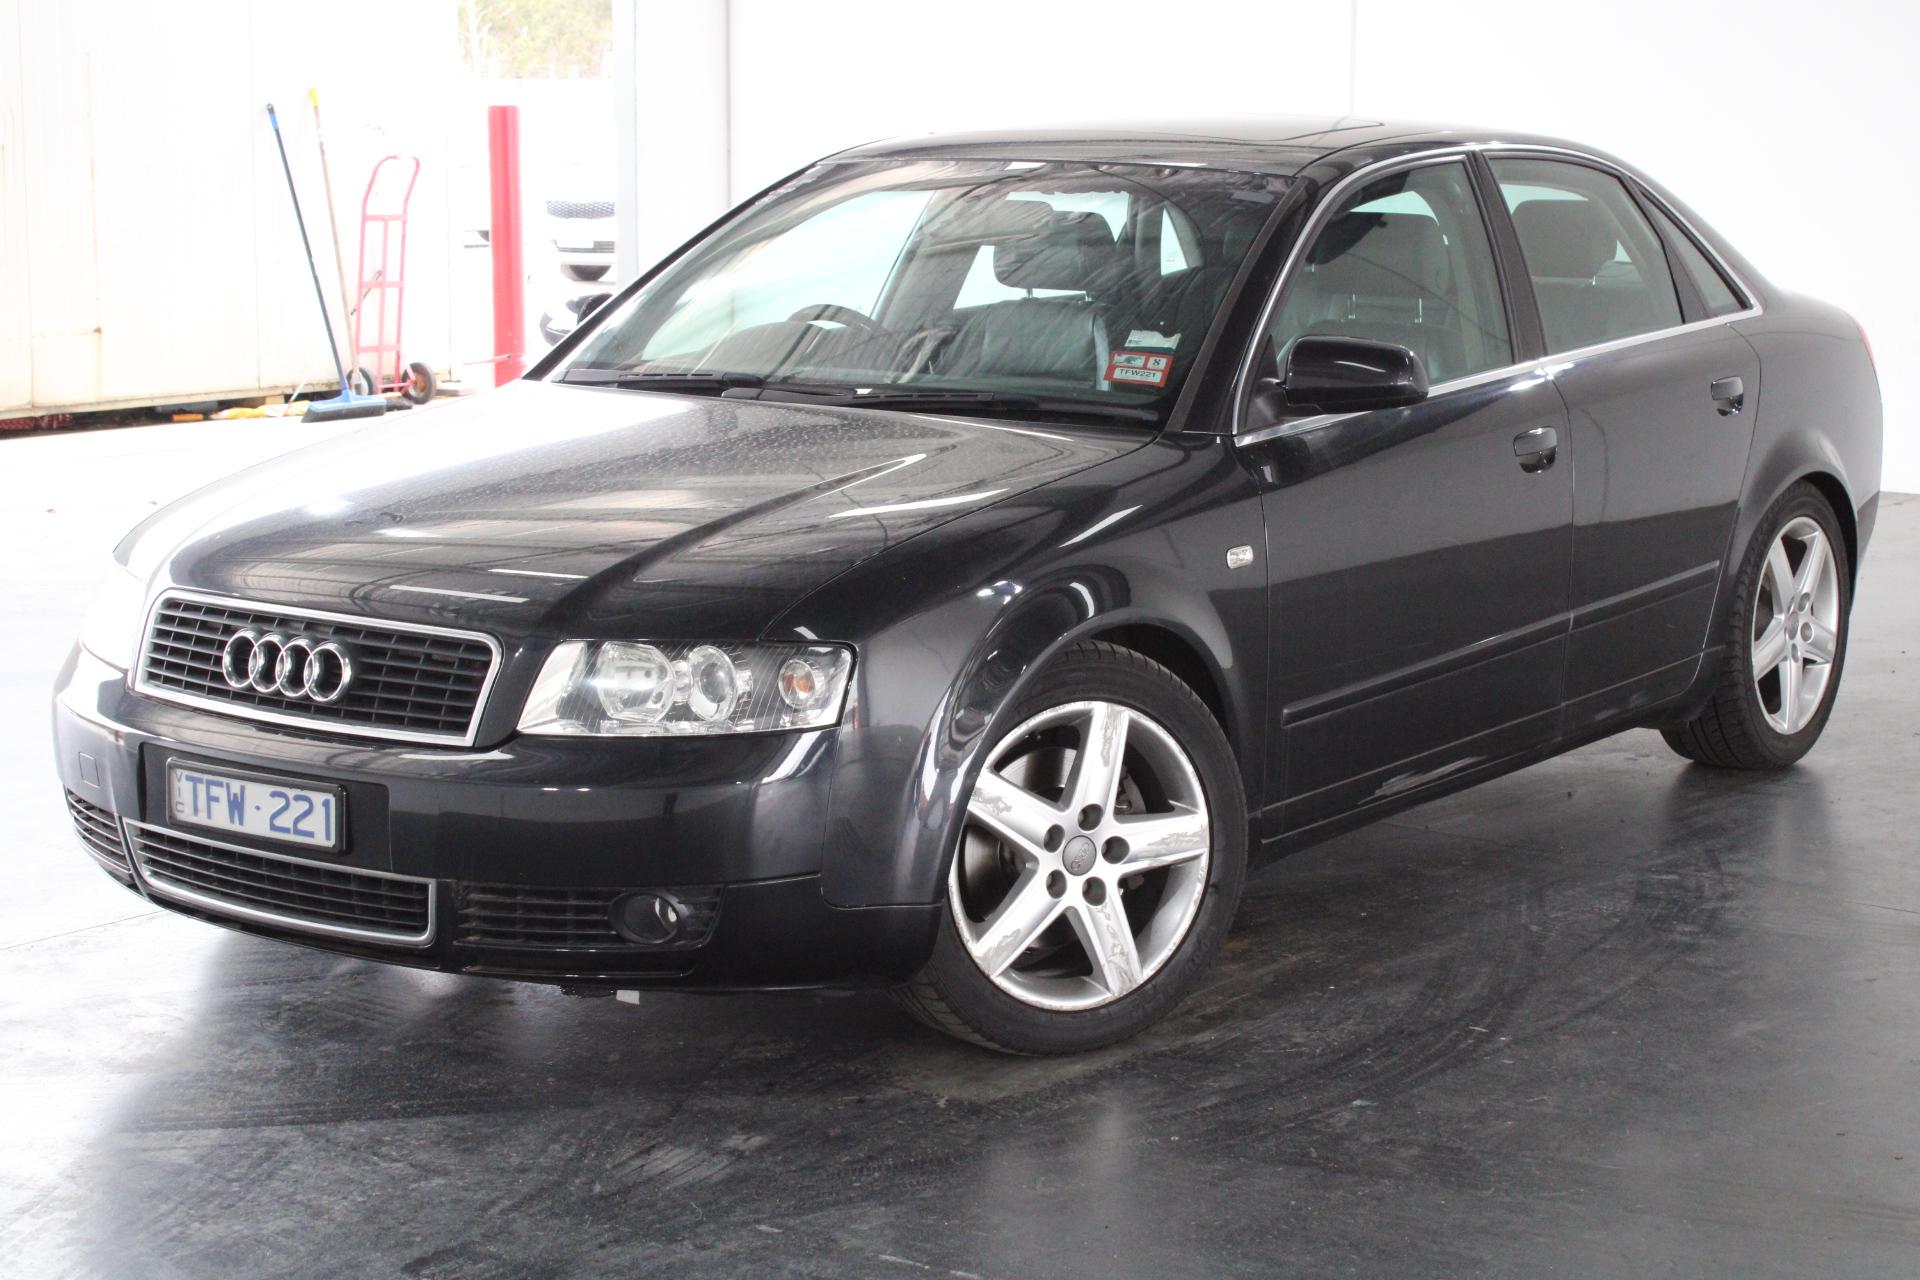 2005 Audi A4 1.8T B6 CVT Sedan